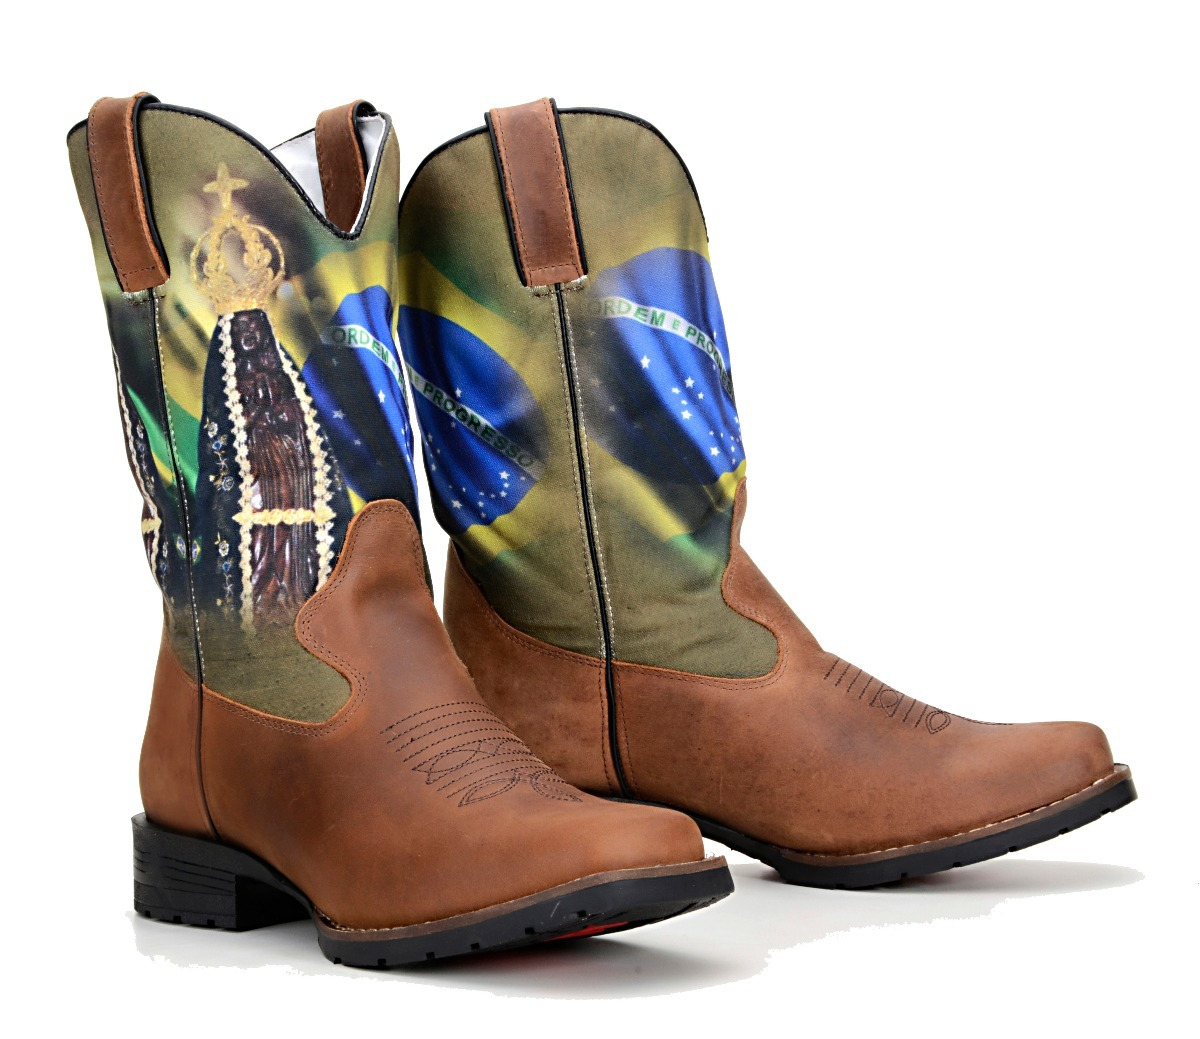 f0470ae81f2d9 Bota Country Masculina Texana Padroeira Brasil Cowboy Peão - R  284 ...